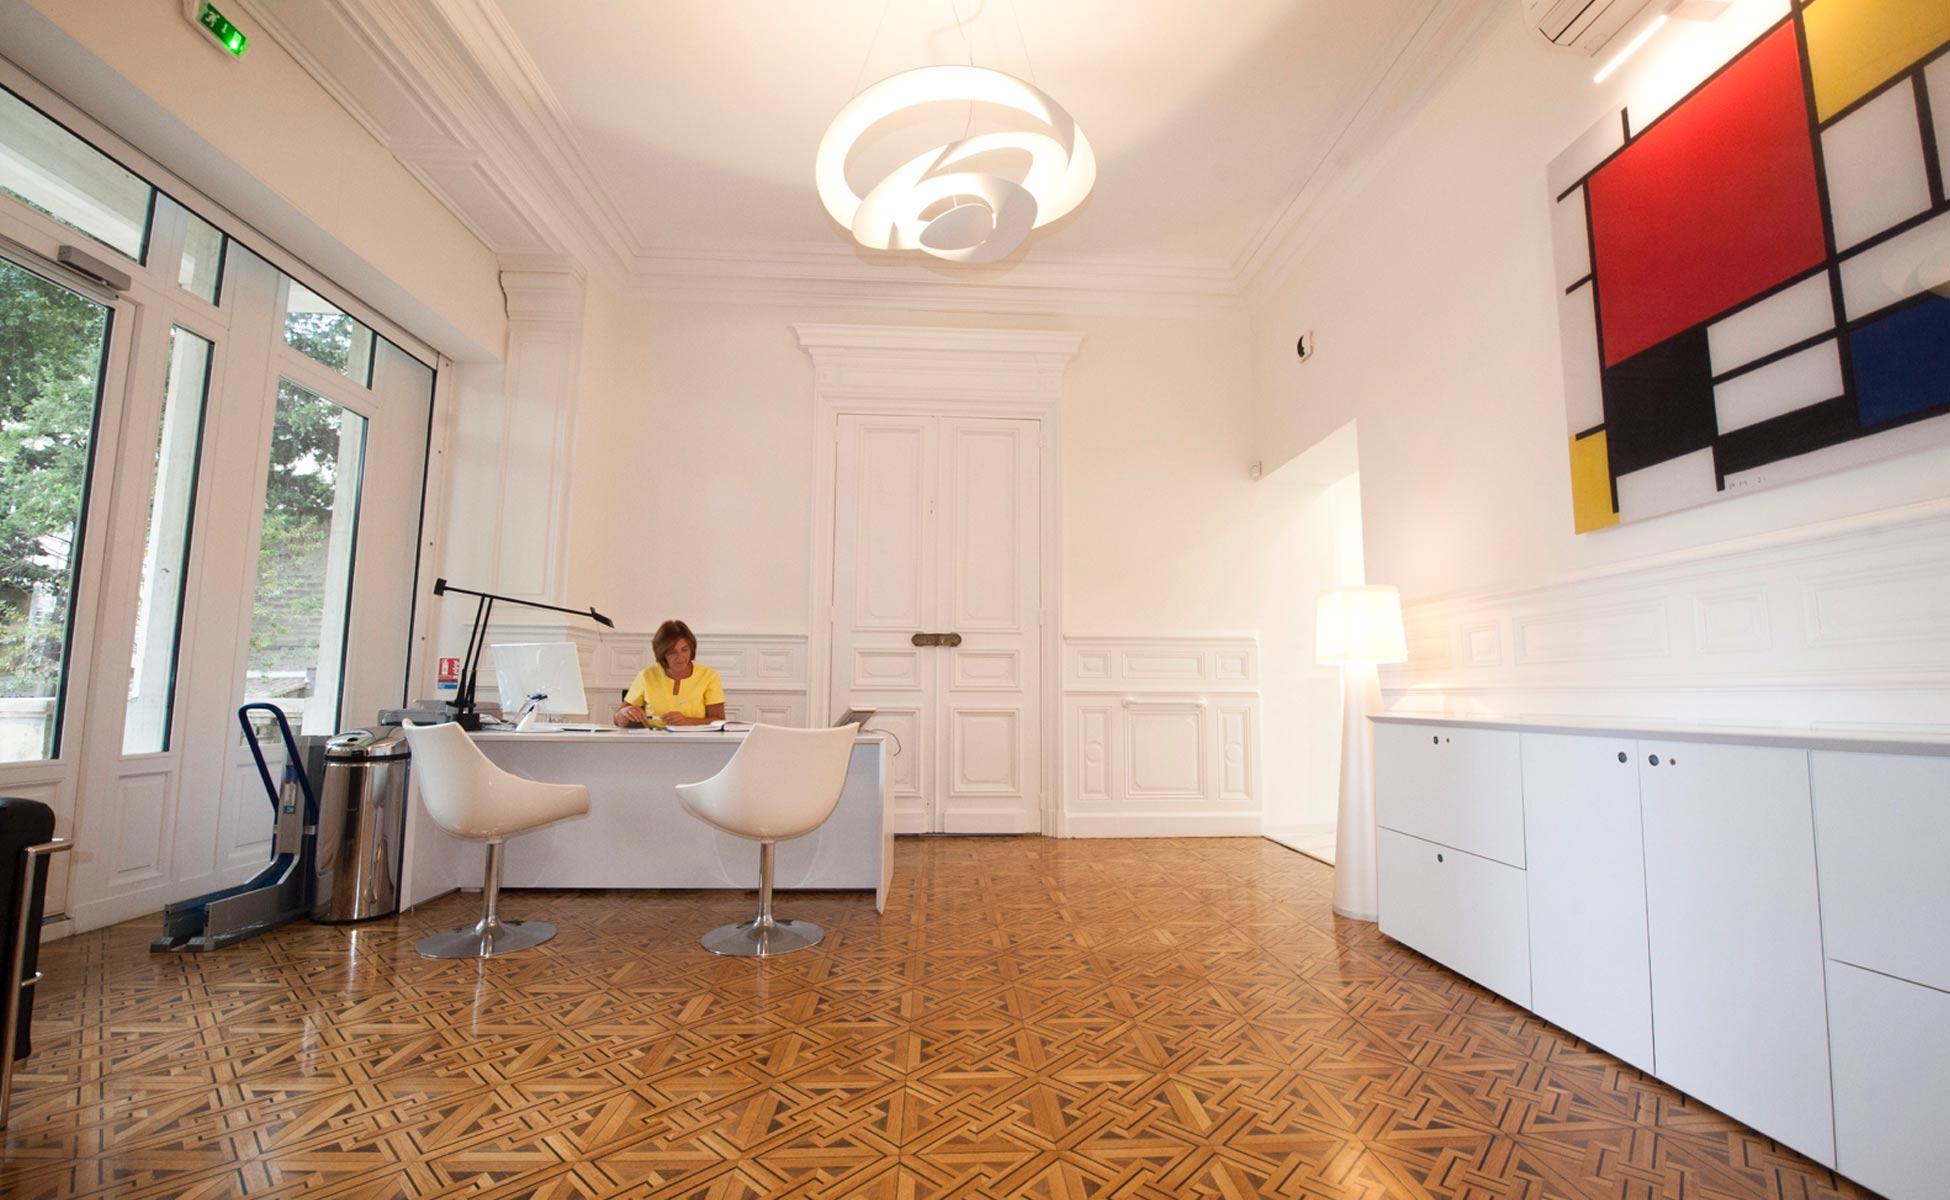 Cabinet implantologie dentaire - Cabinet echographie nantes ...